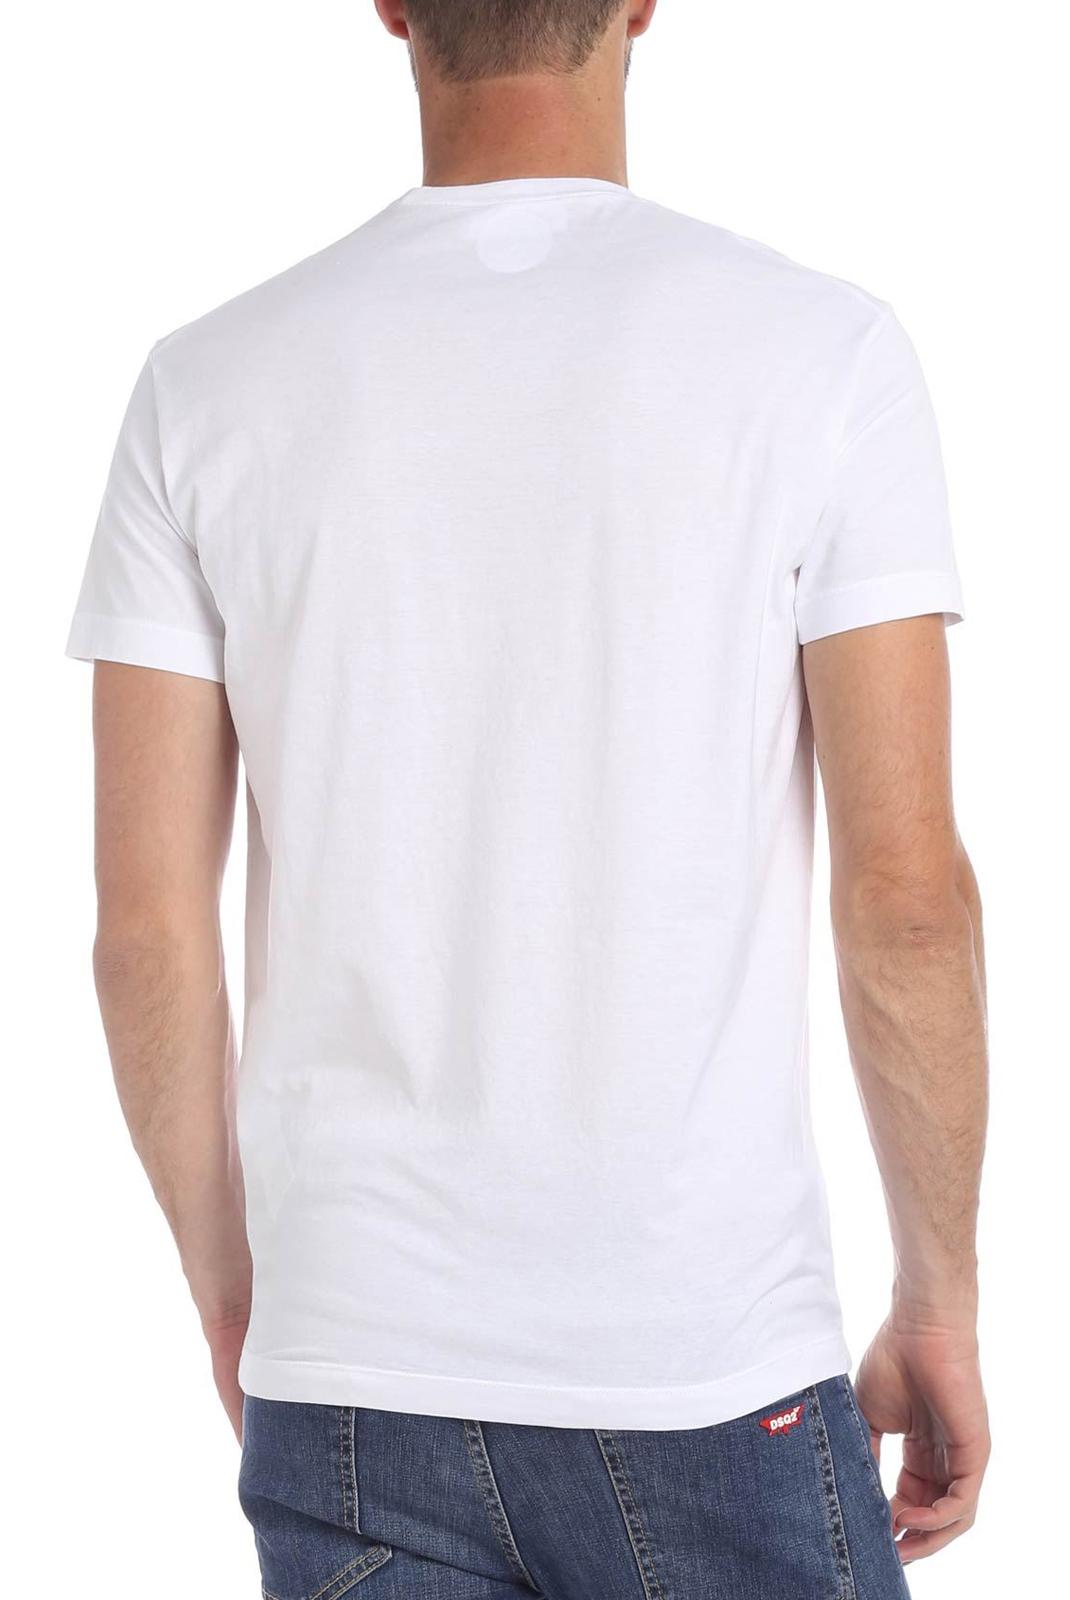 Tee-shirts  Dsquared2 S74GD0558 100 BLANC